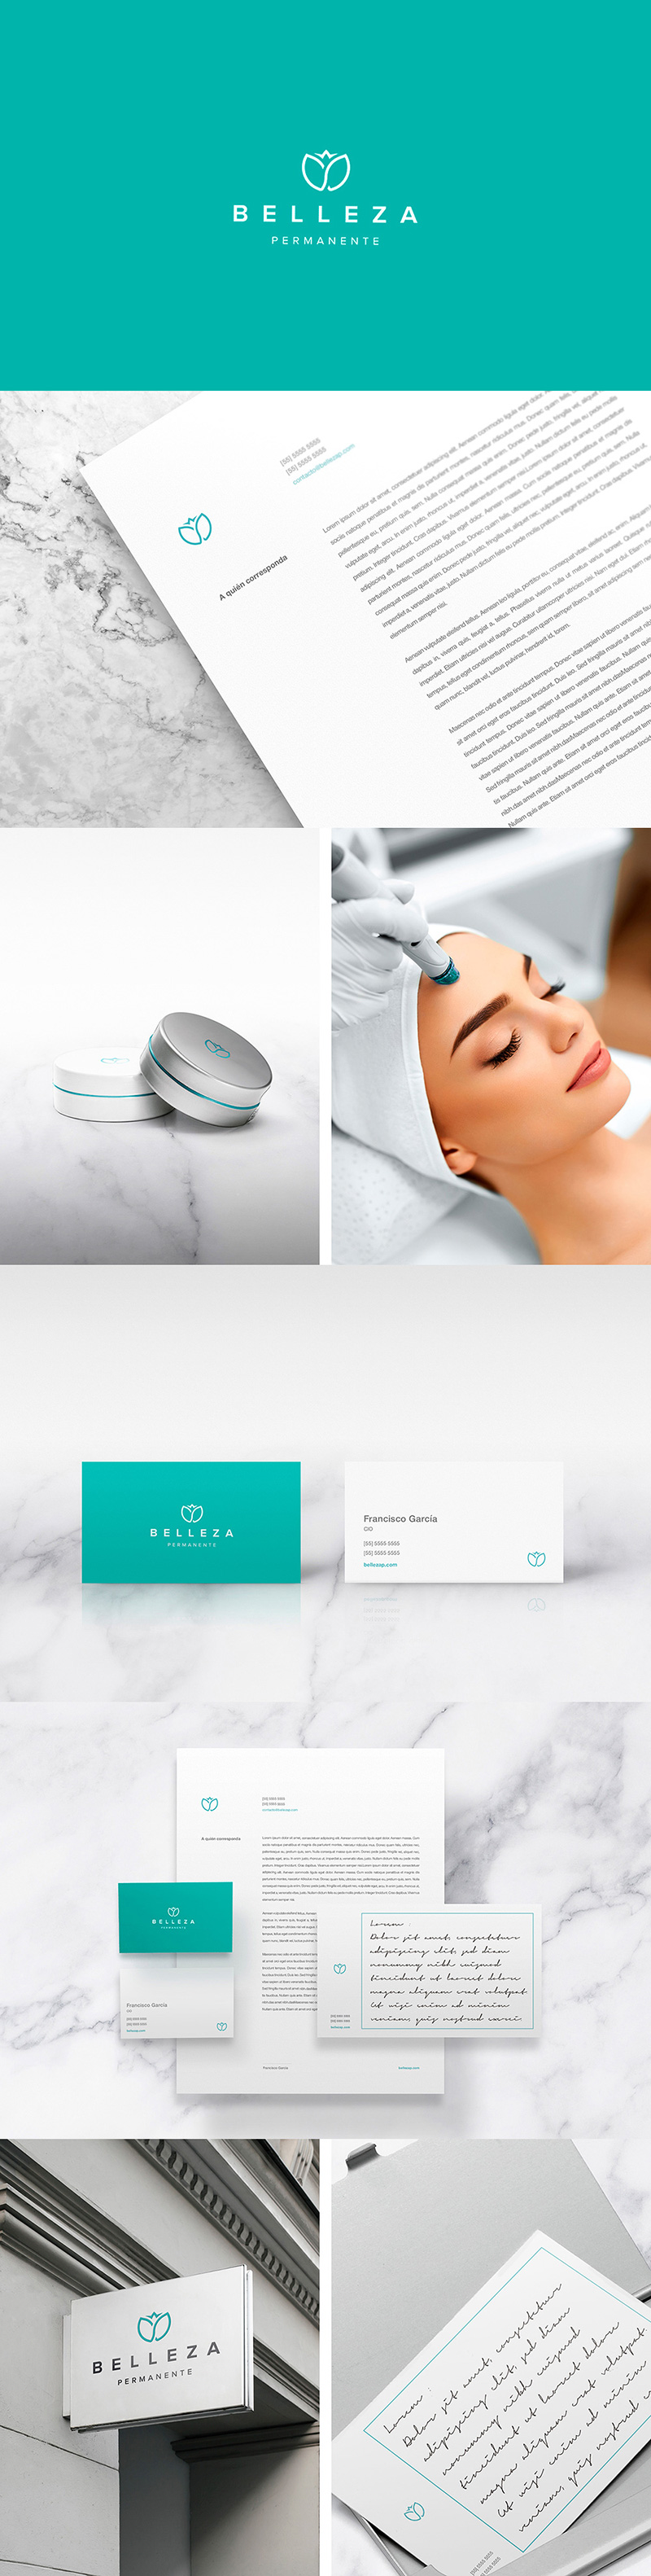 Belleza Permanente Beauty Clinic by Matias